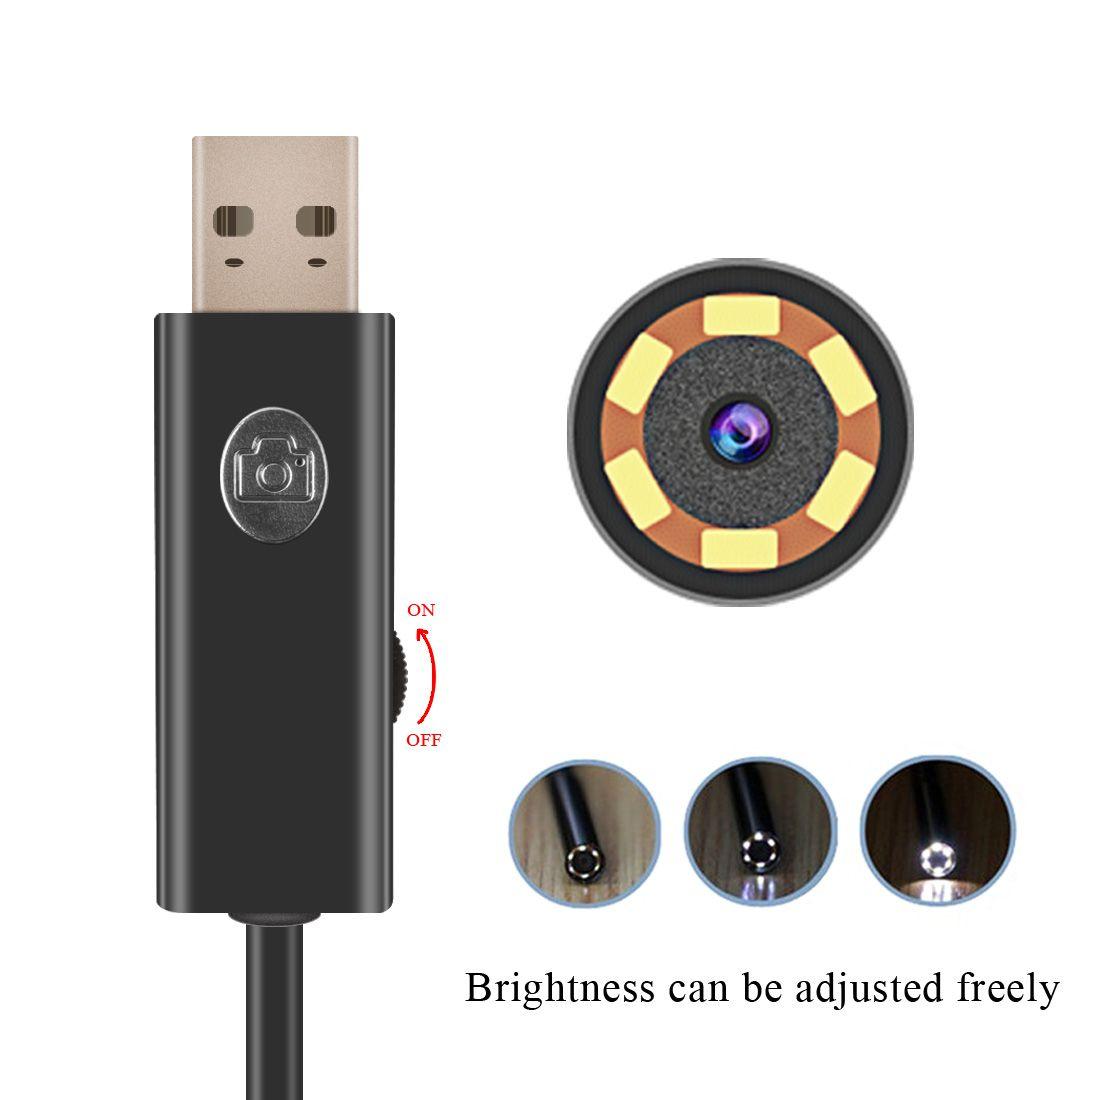 New Arrival Wireless Wifi Endoscope Camera HD 720P Waterproof Borescope Snake Tube Mini Camera For Android iOS Windows